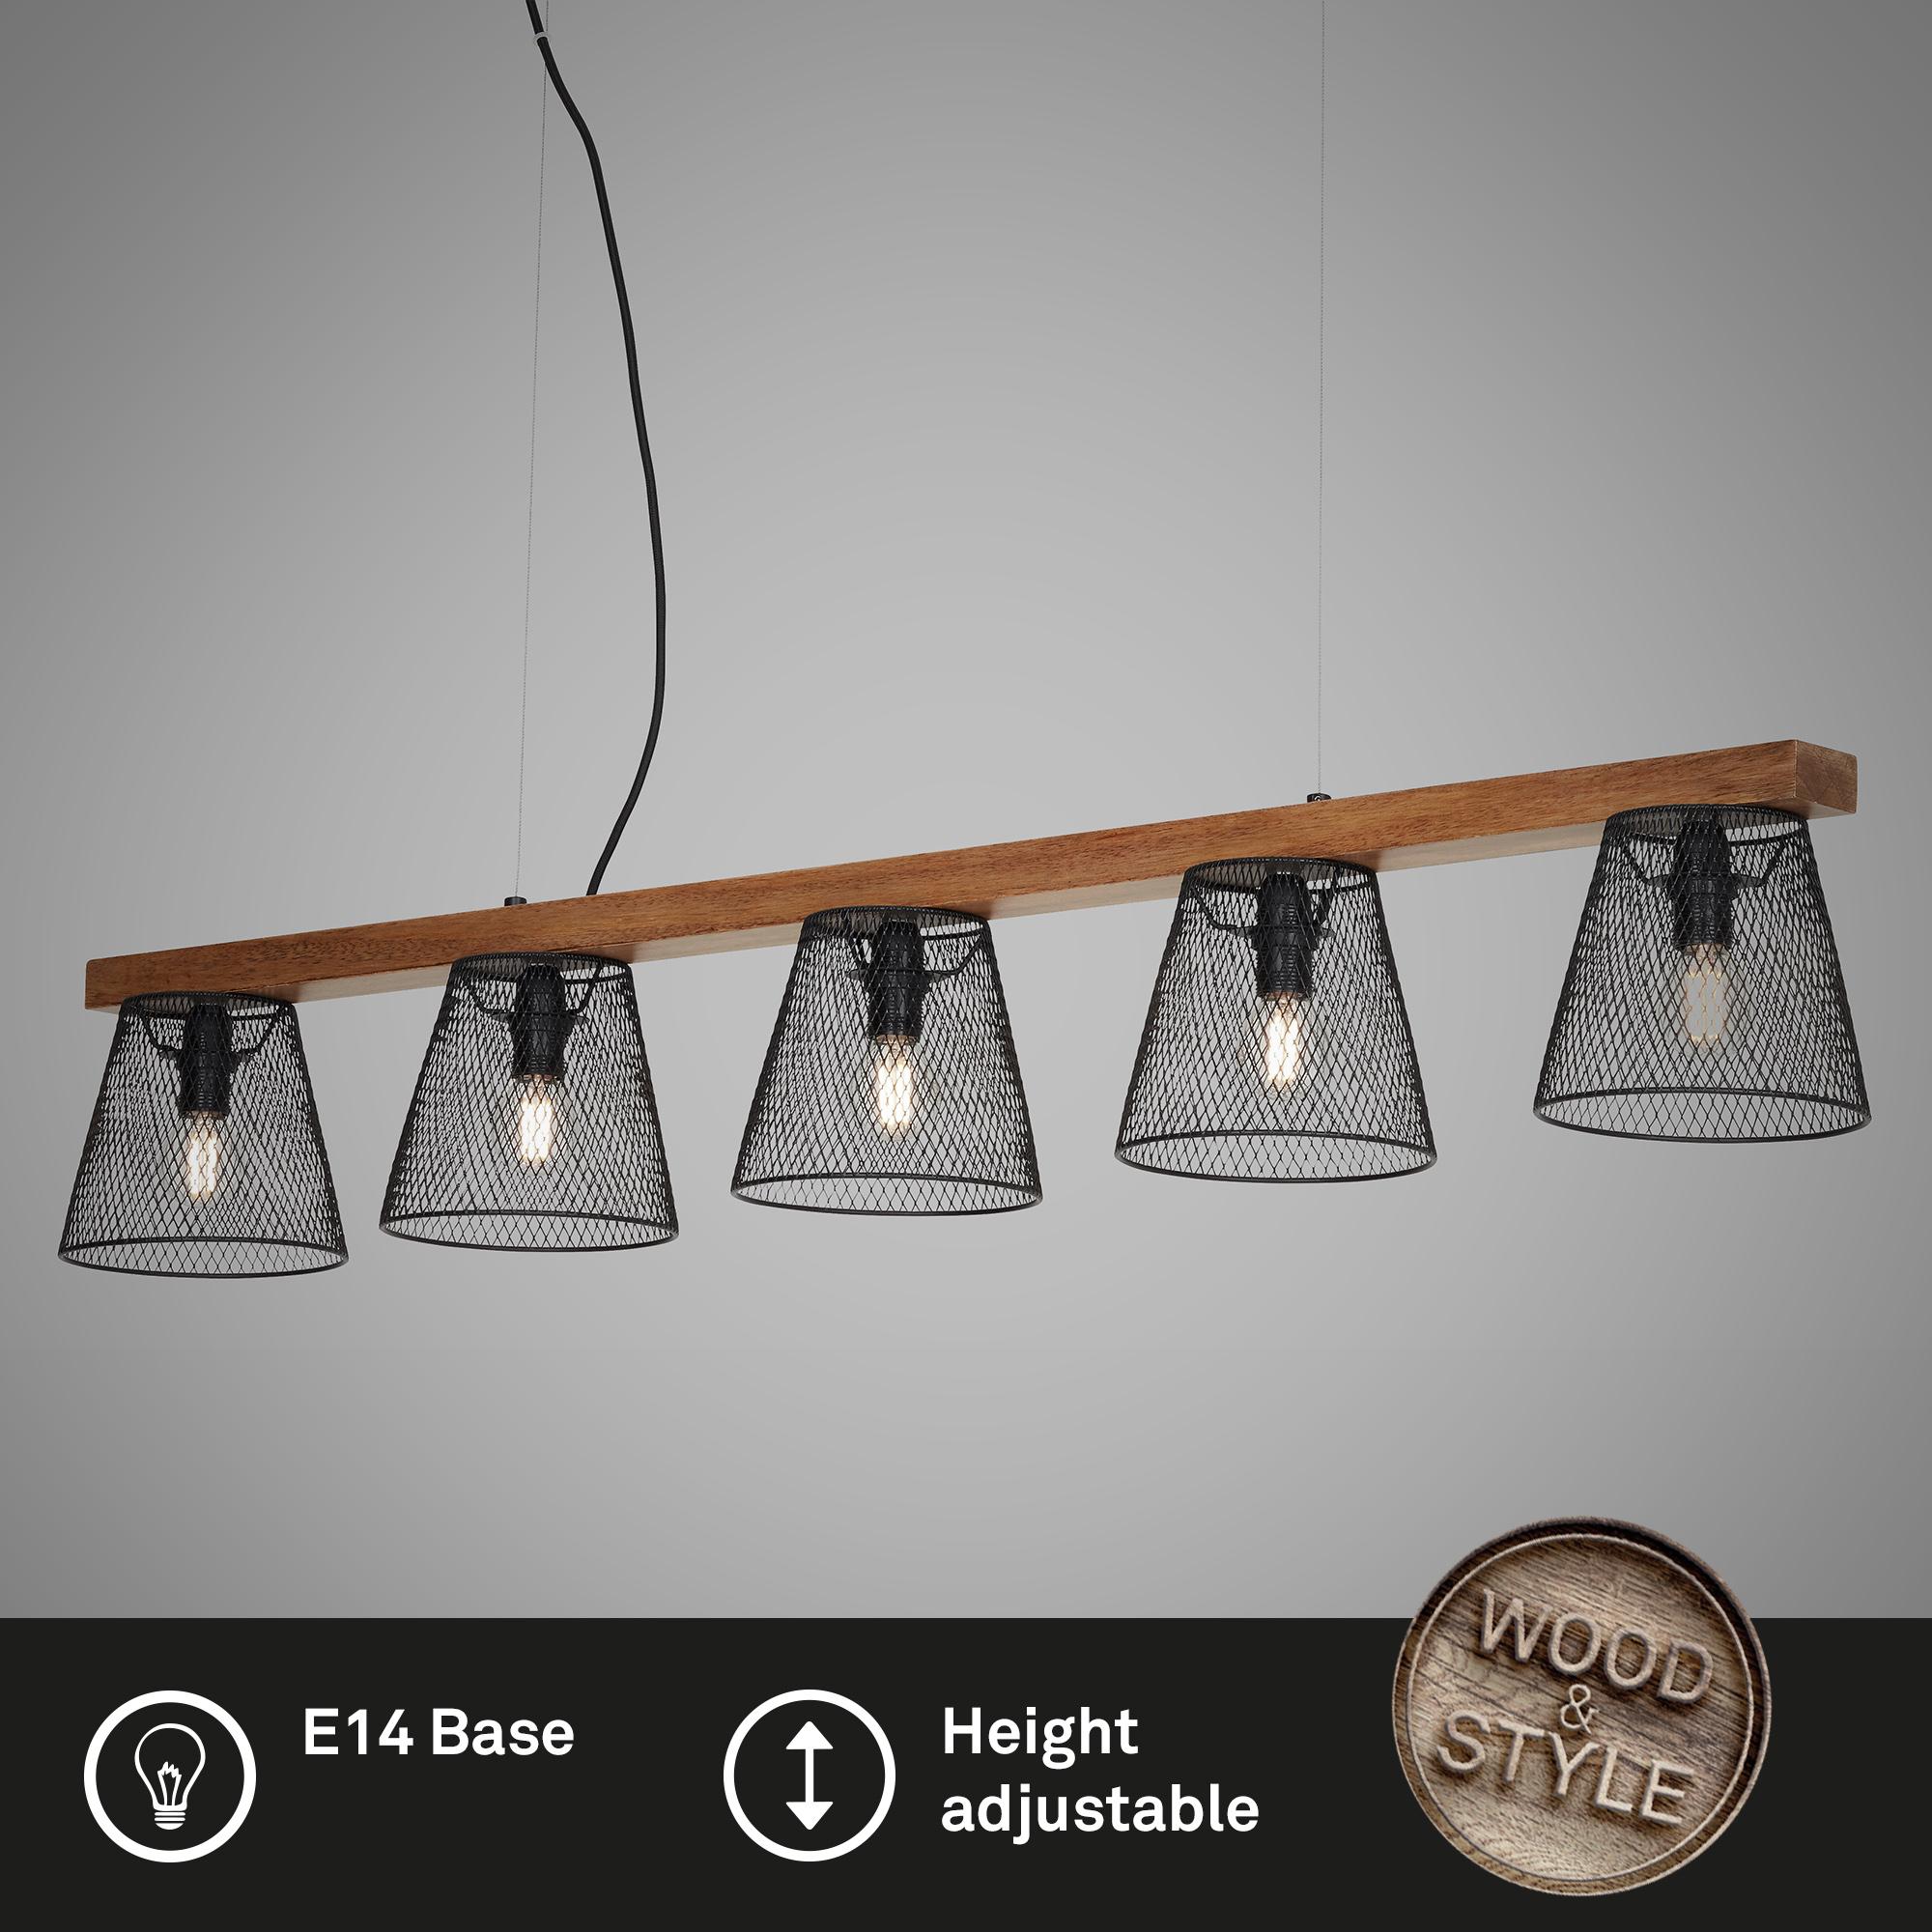 LED Pendelleuchte, 110 cm, max. 25 W, Schwarz